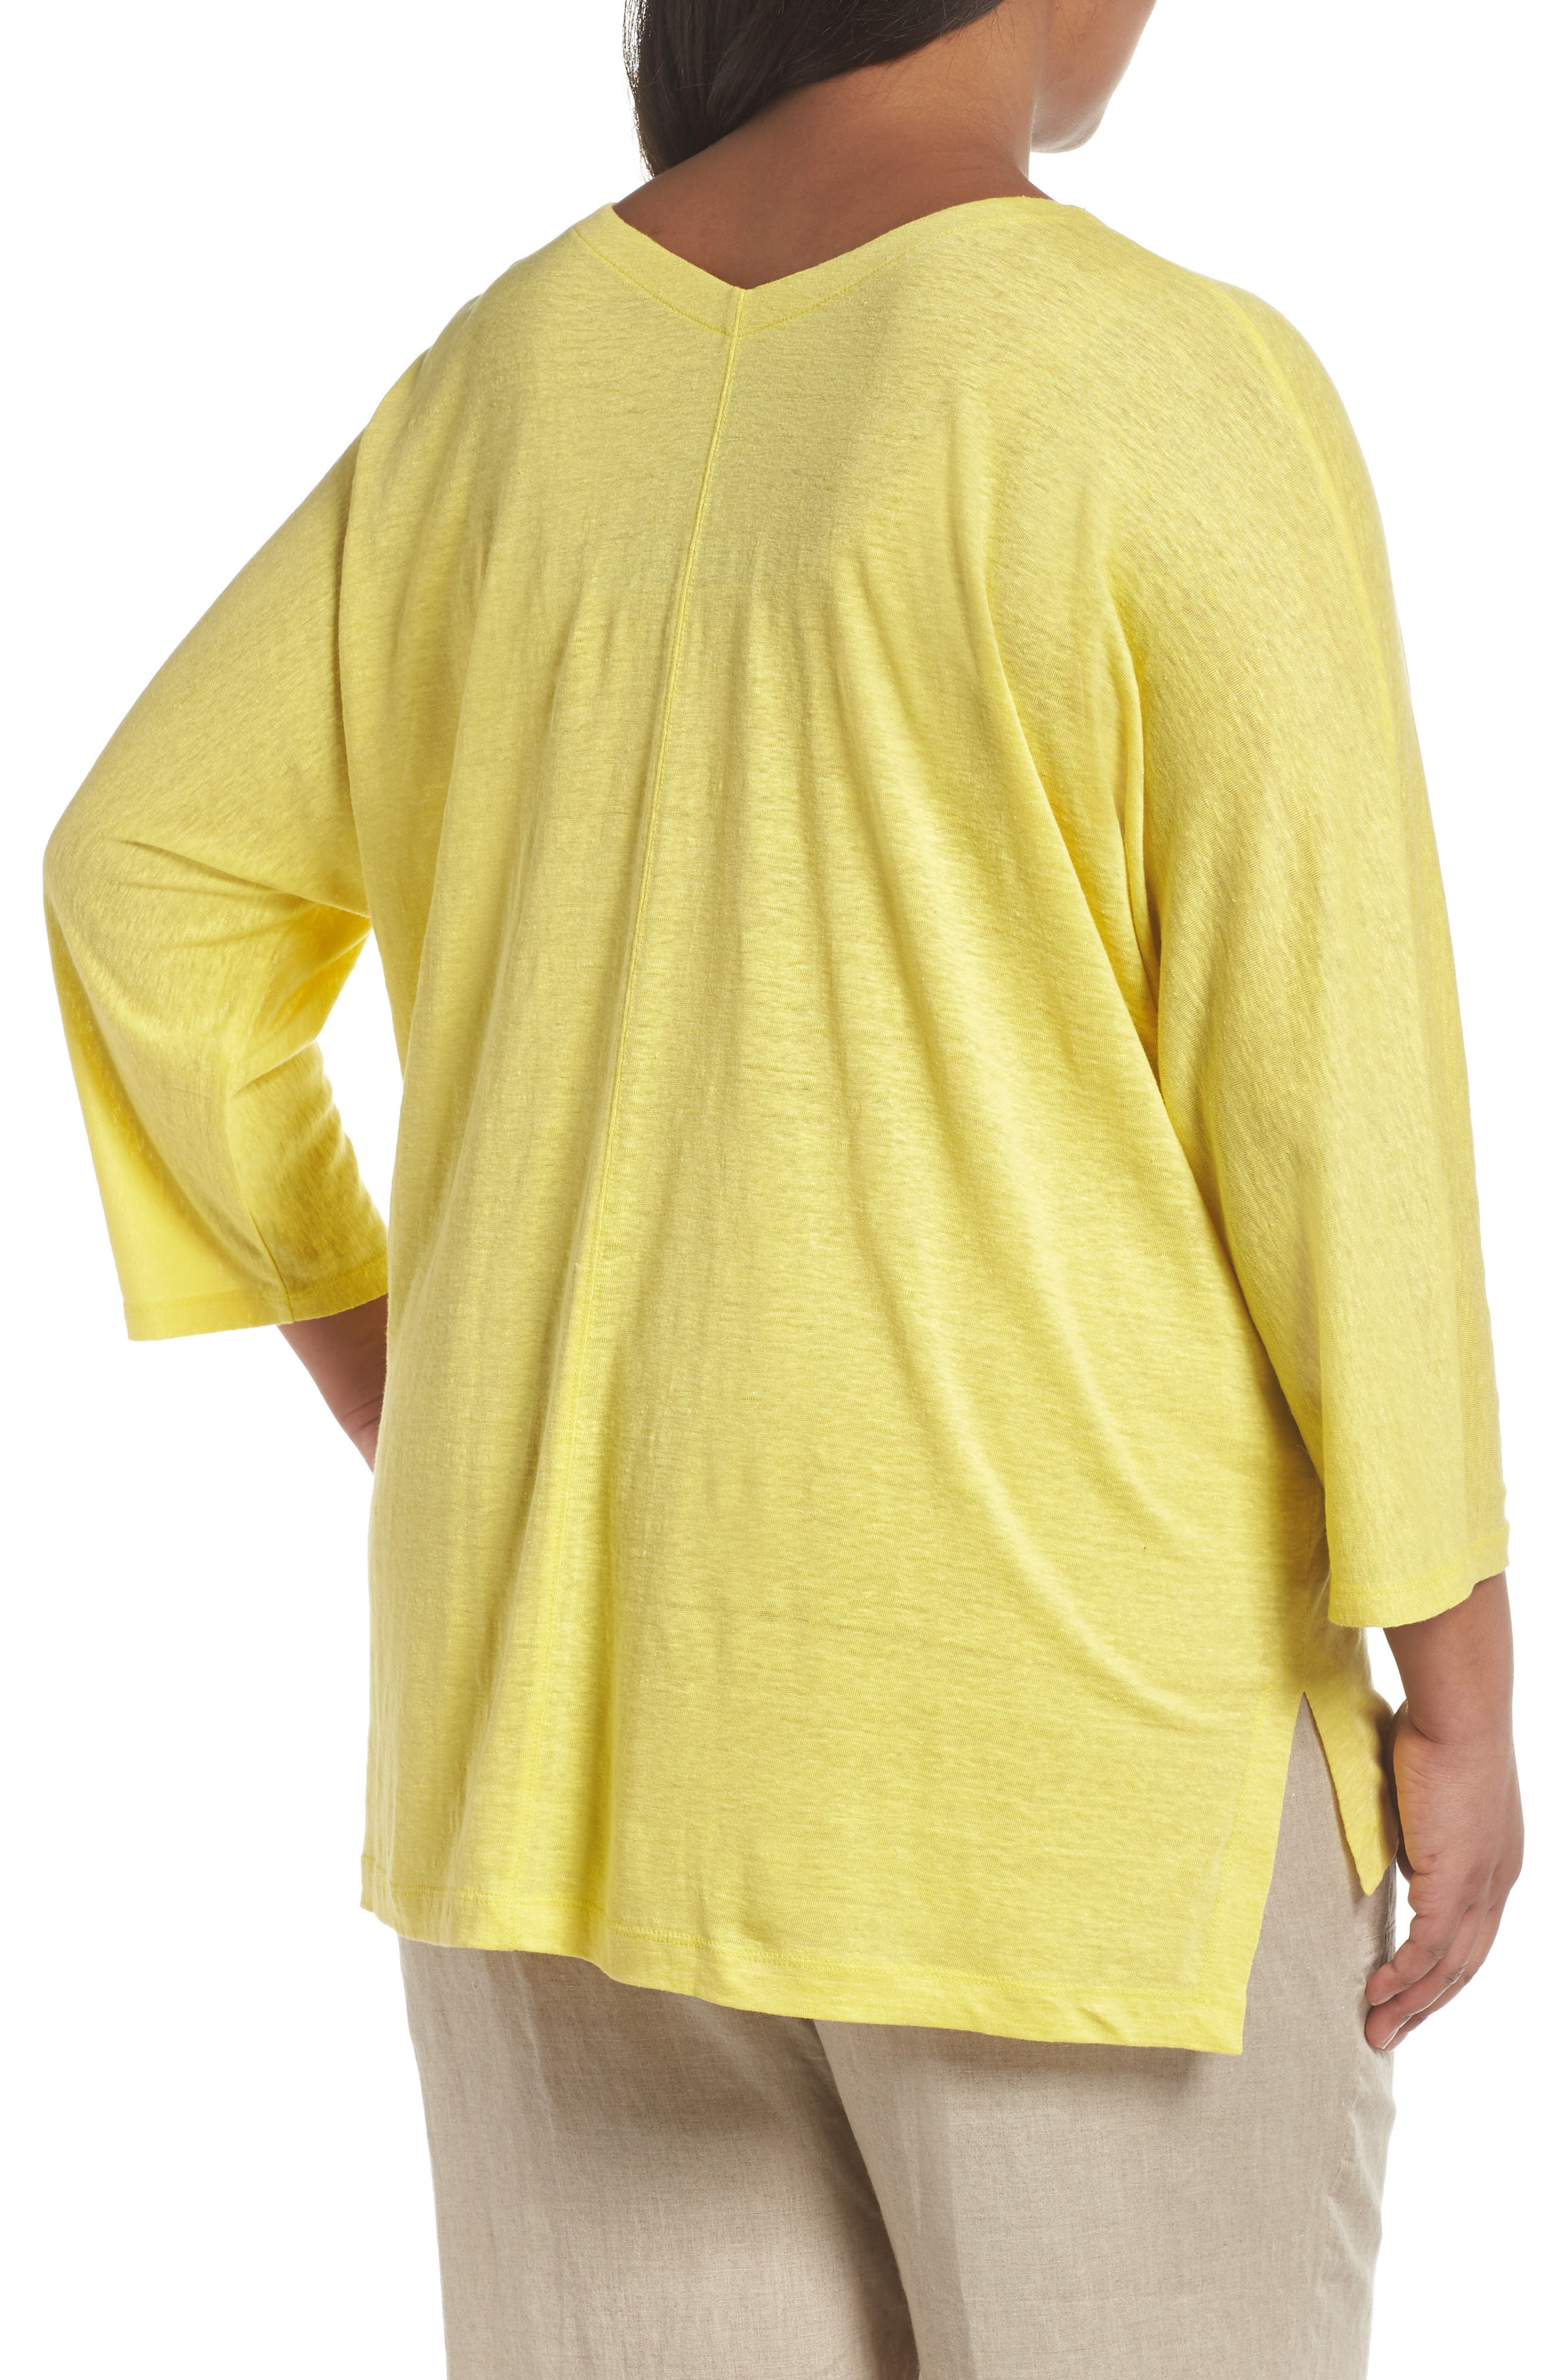 Organic Linen Top,                             Alternate thumbnail 2, color,                             Yarrow